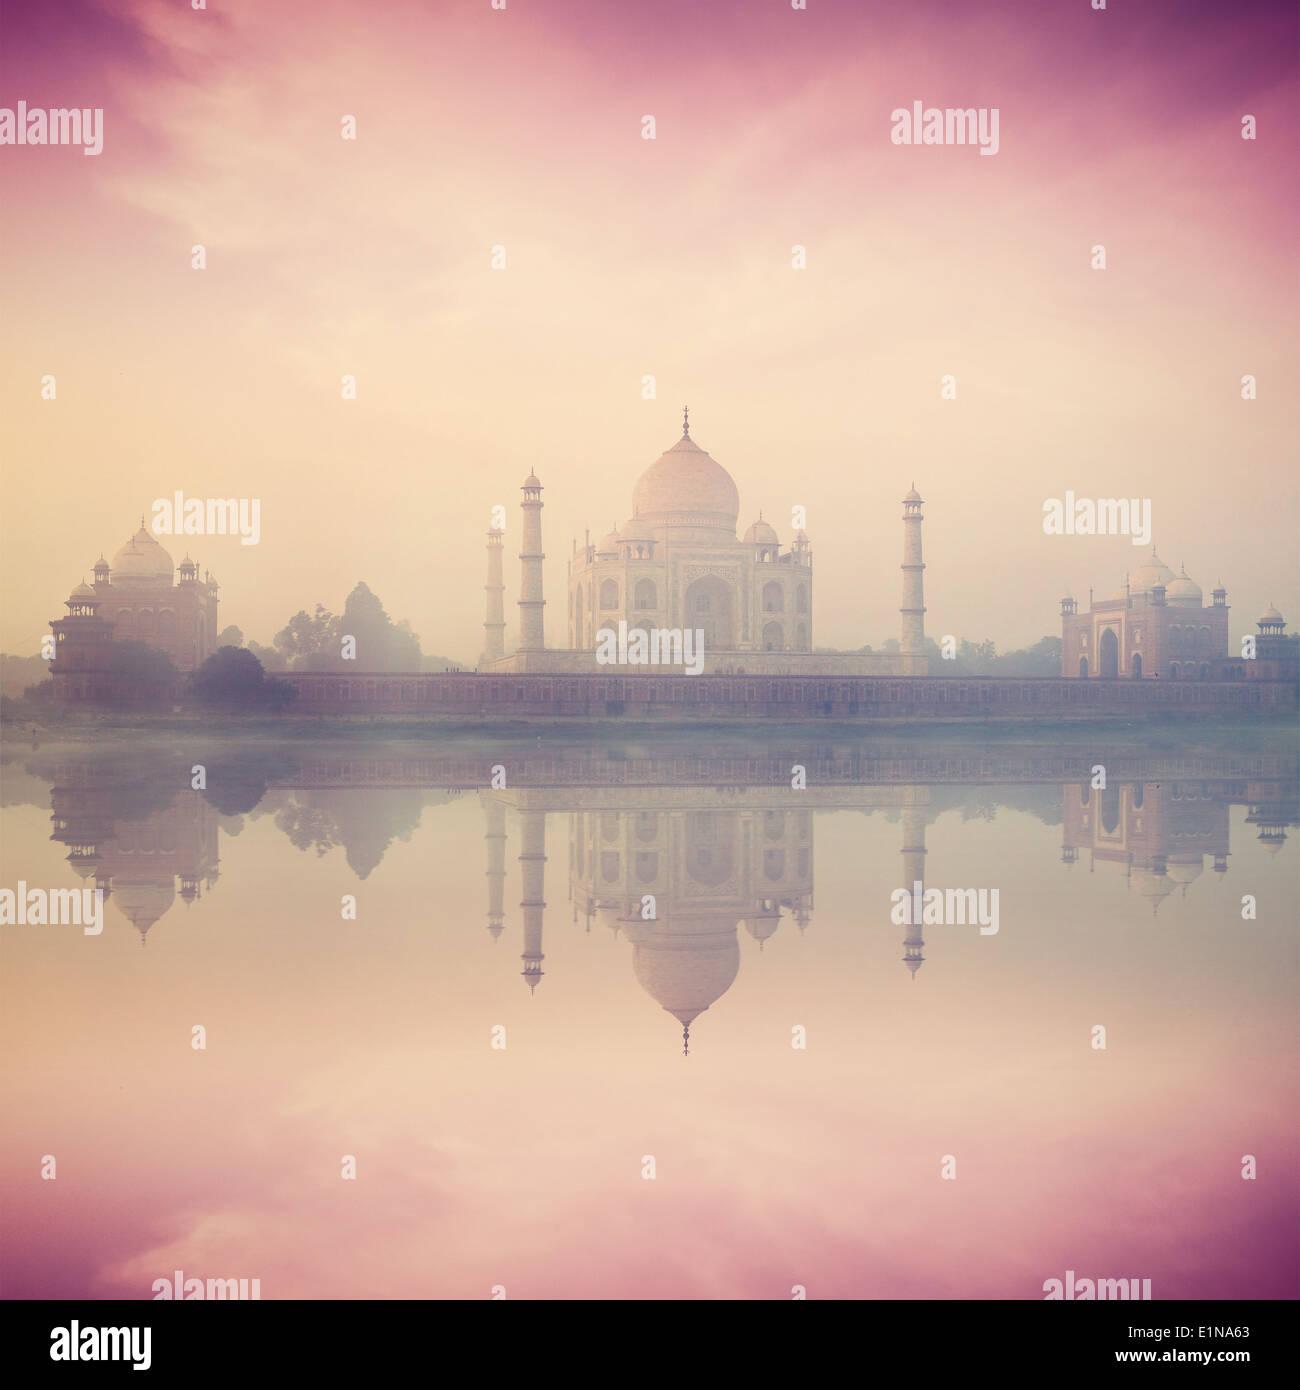 Vintage Retro-Hipster Stil Bild des Taj Mahal auf Sonnenaufgang Sonnenuntergang Spiegelung im Yamuna Fluß Panorama Stockbild